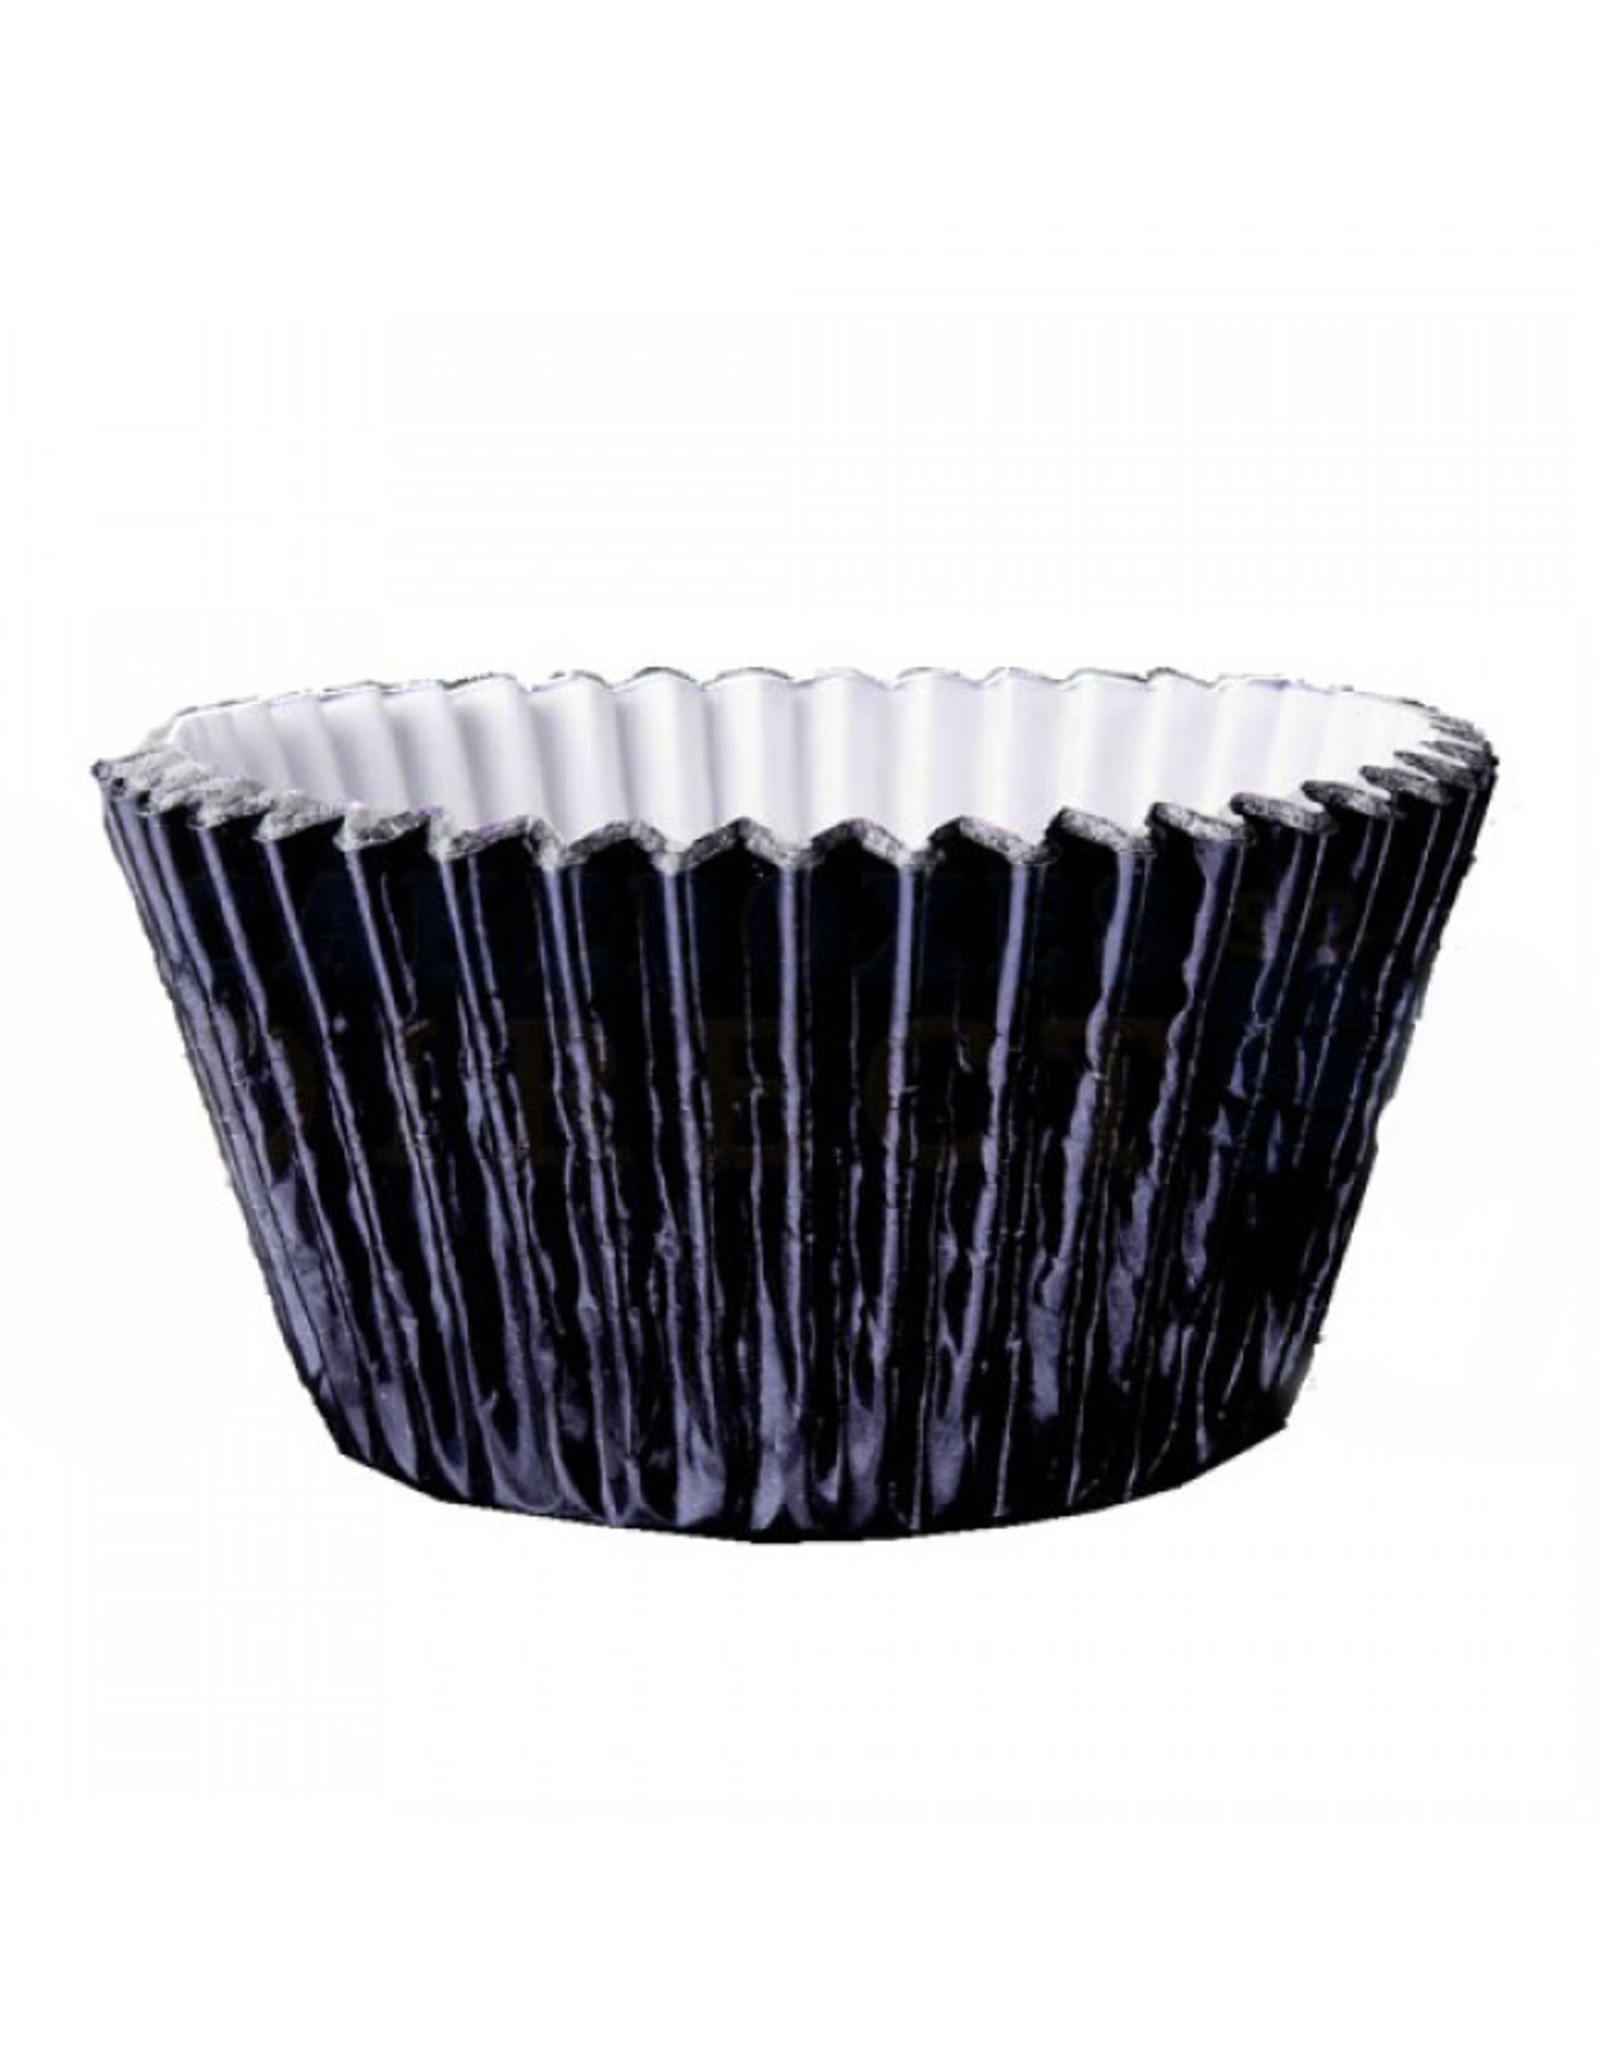 Metallic baking cups - black (500 pieces)